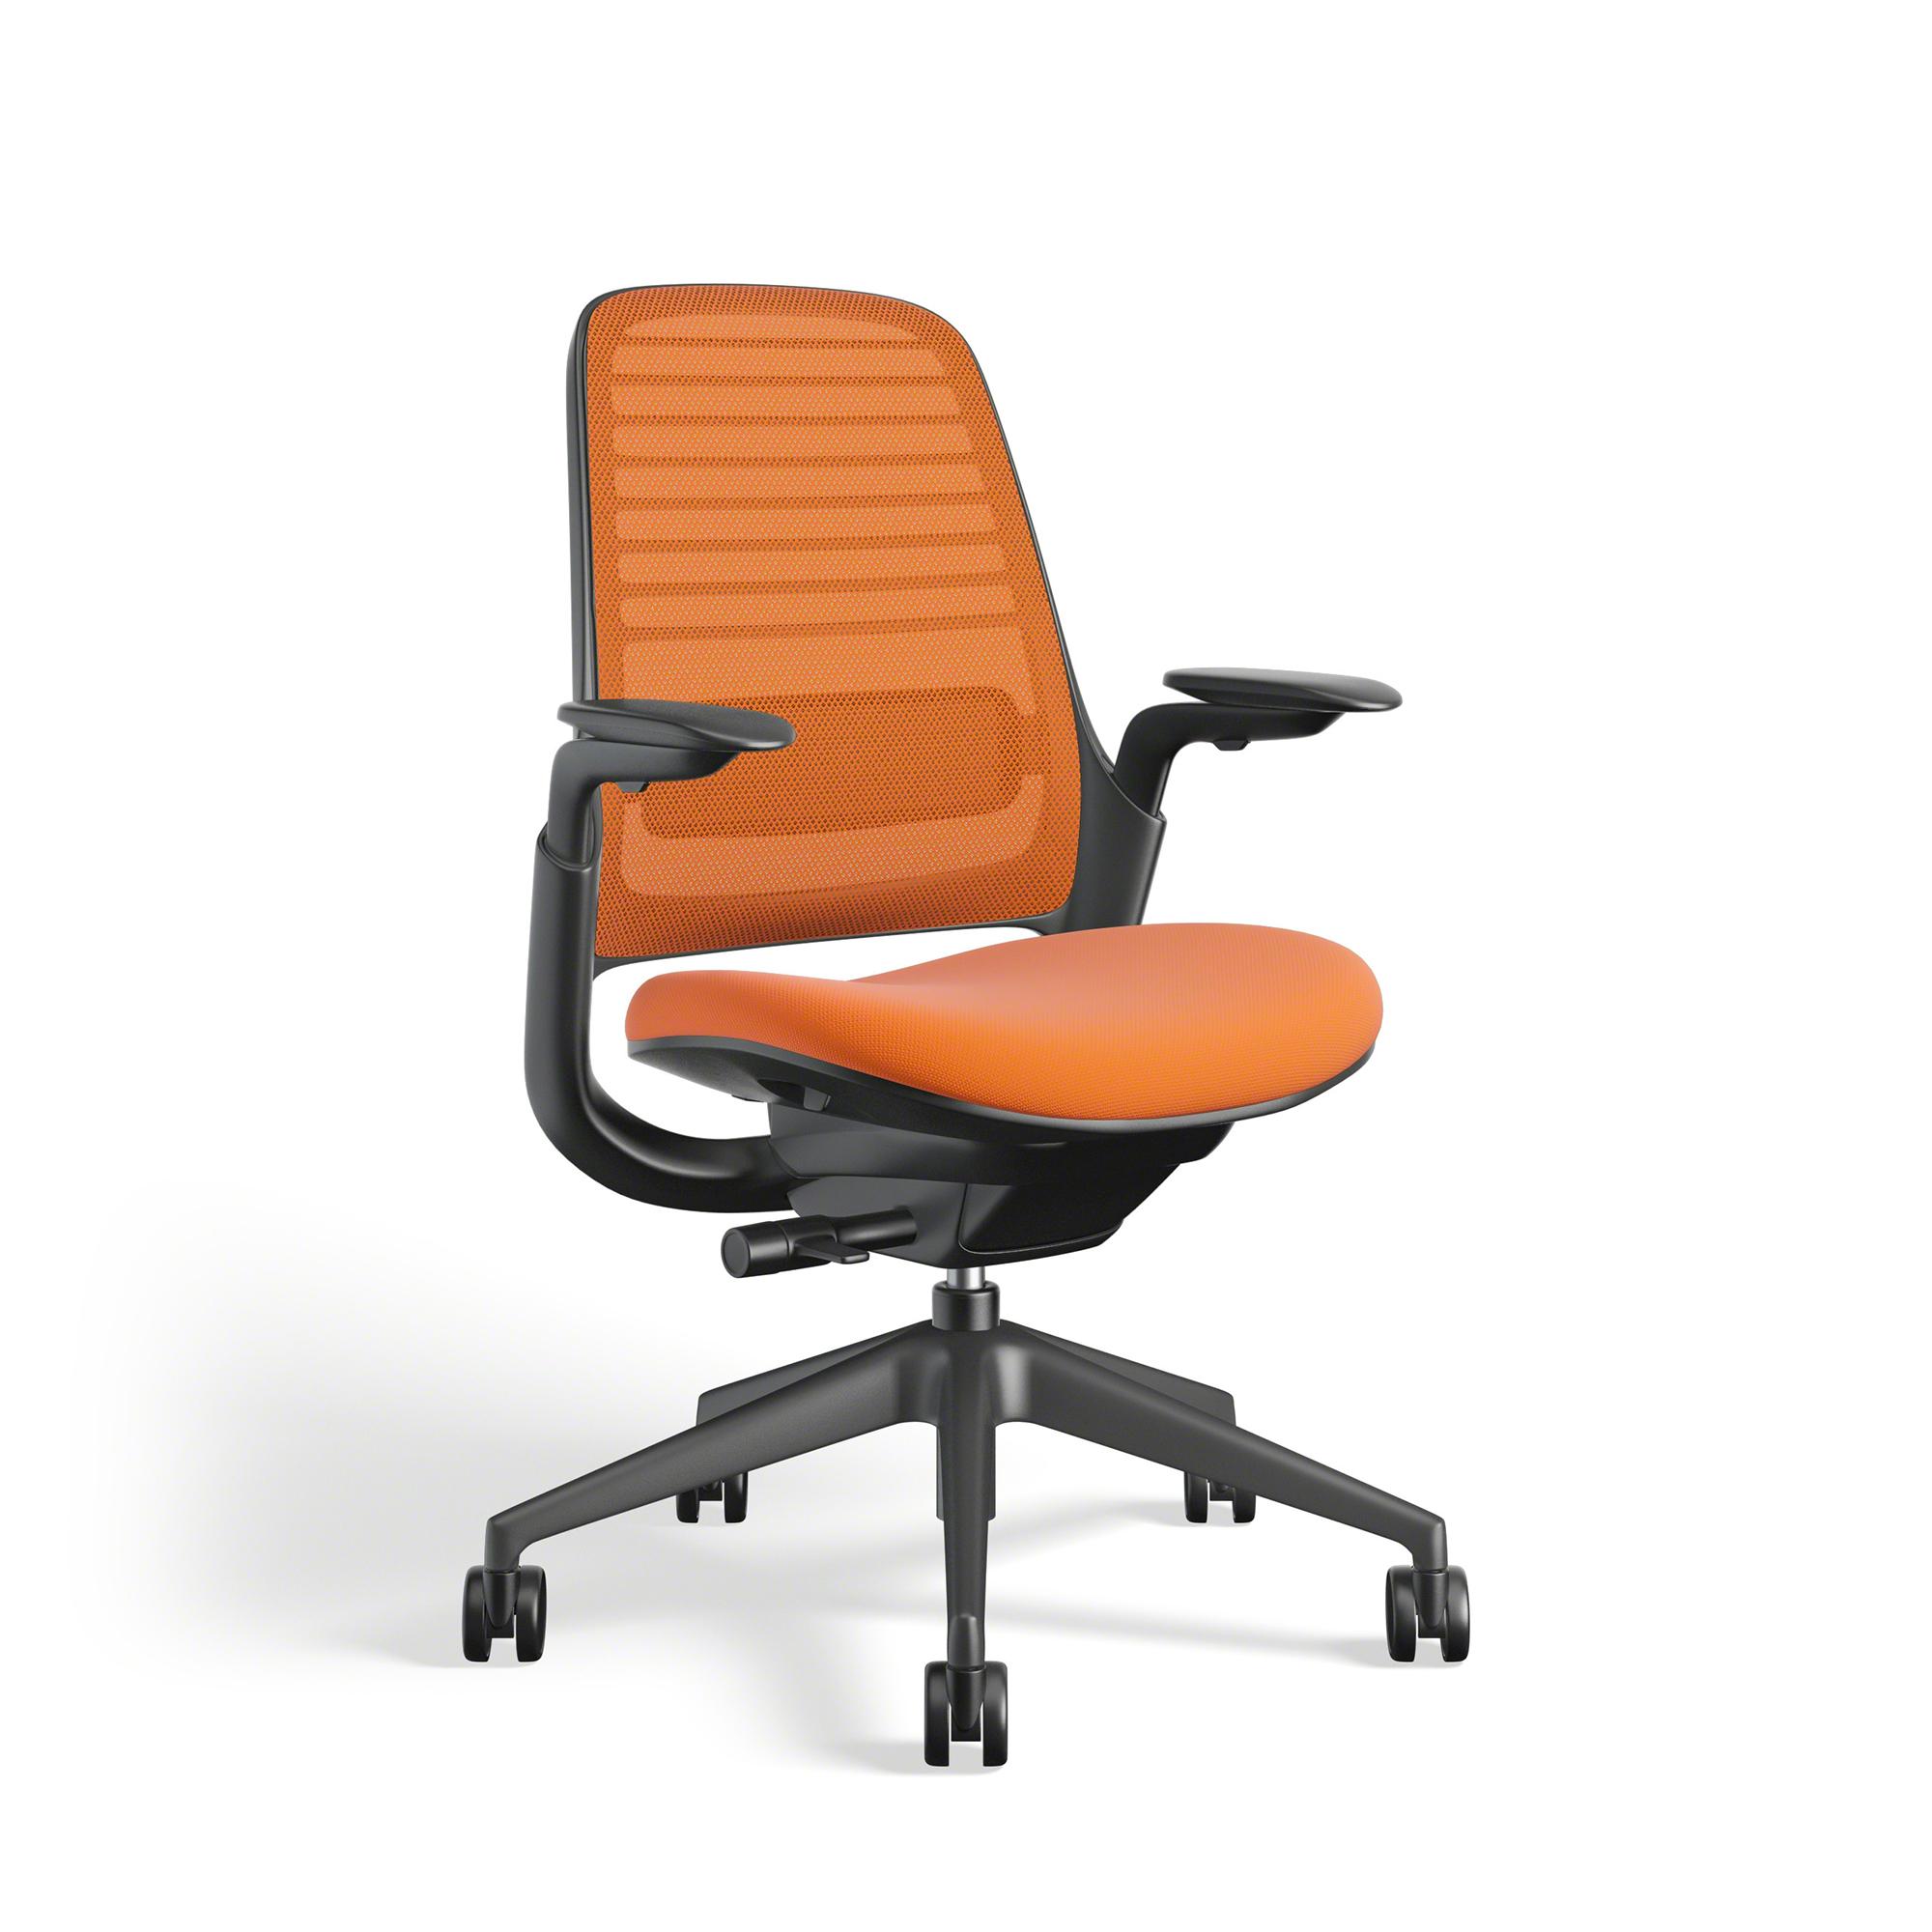 Orange Steelcase Series 1 Chair, Black Frame | Office Furniture | Poppin